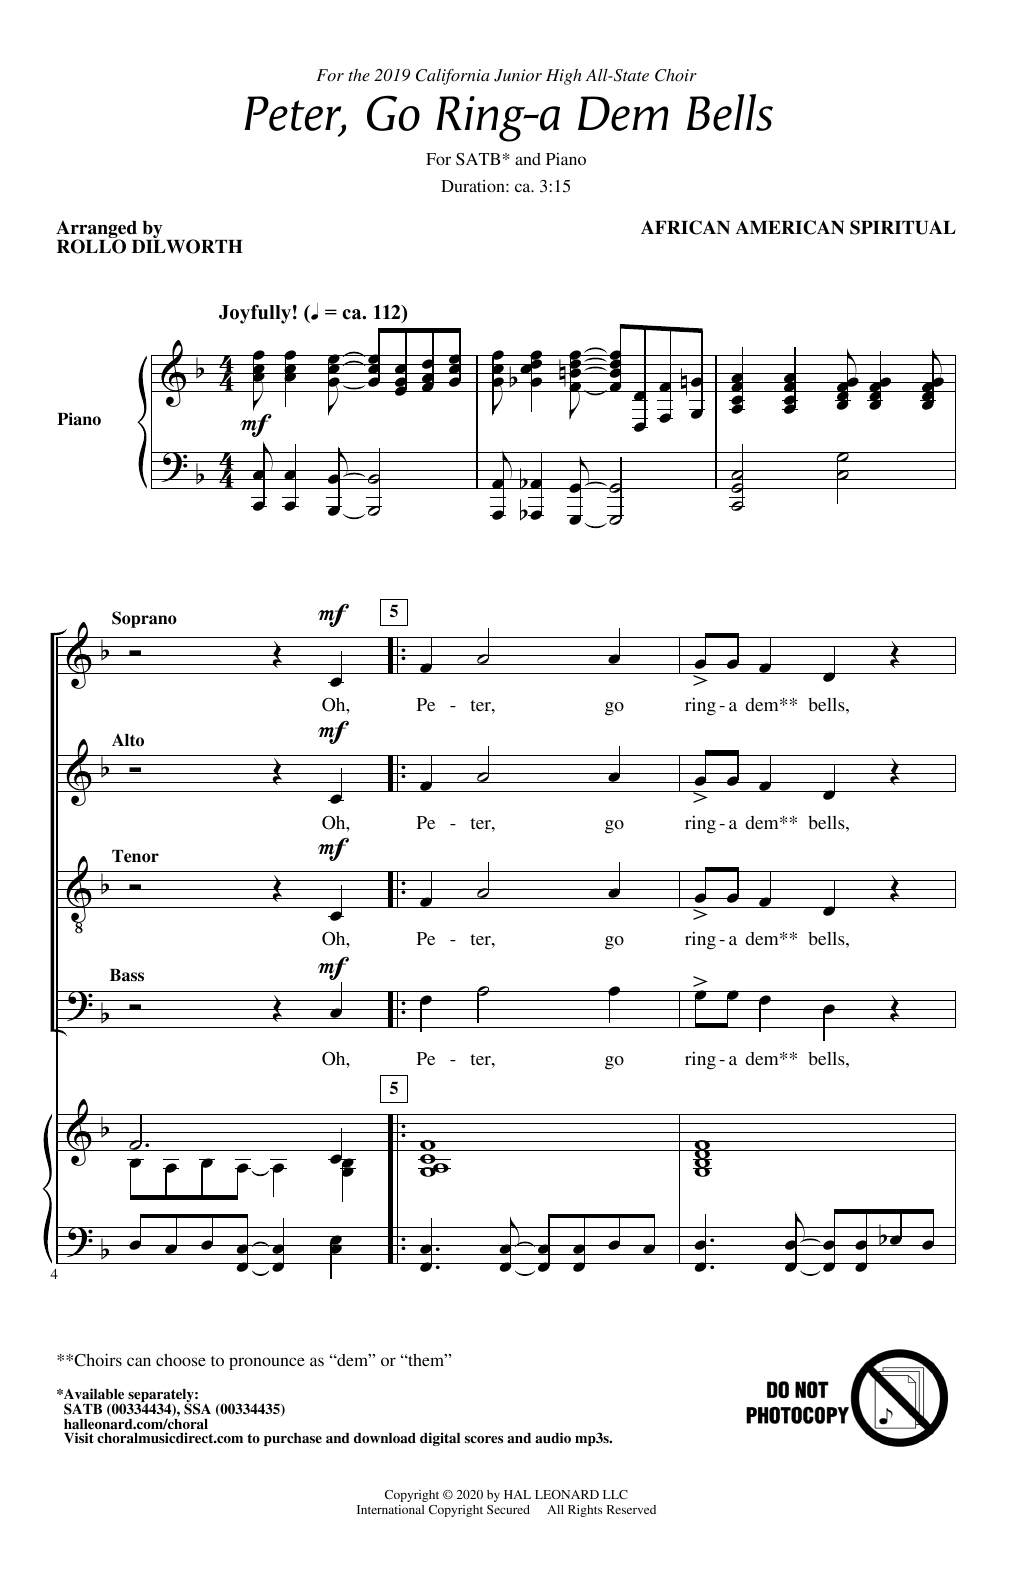 Peter Go Ring-A Dem Bells (arr. Rollo Dilworth) (SATB Choir)